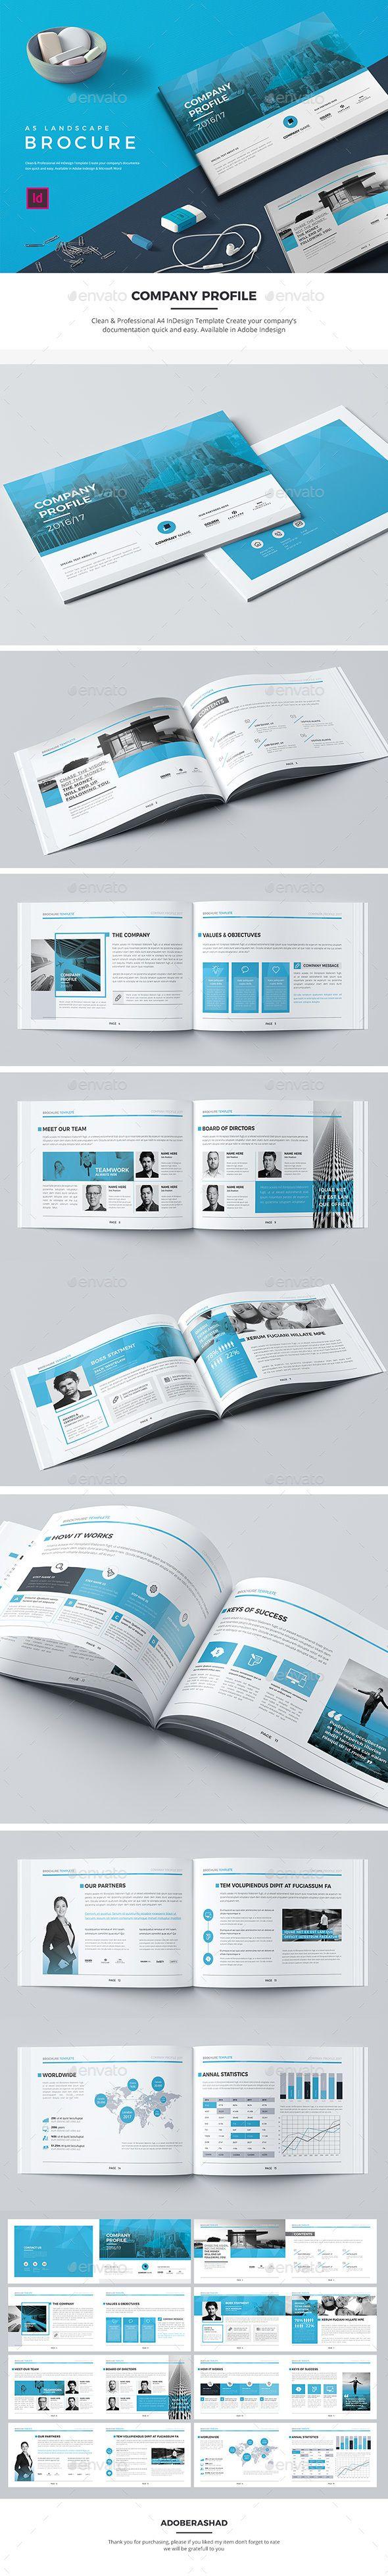 Pin by Bashooka Web & Graphic Design on Company Profile Design ...